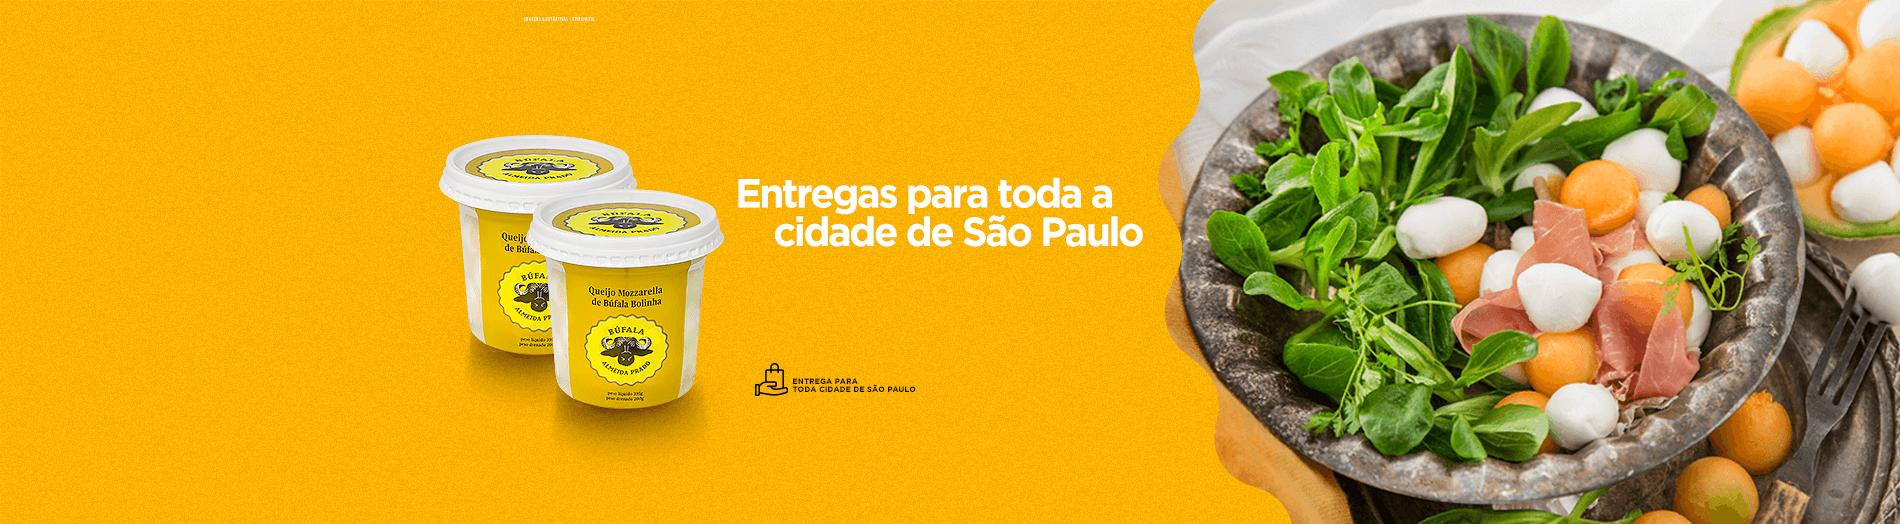 Banner_Bufala_Almeida_Prado_03.png